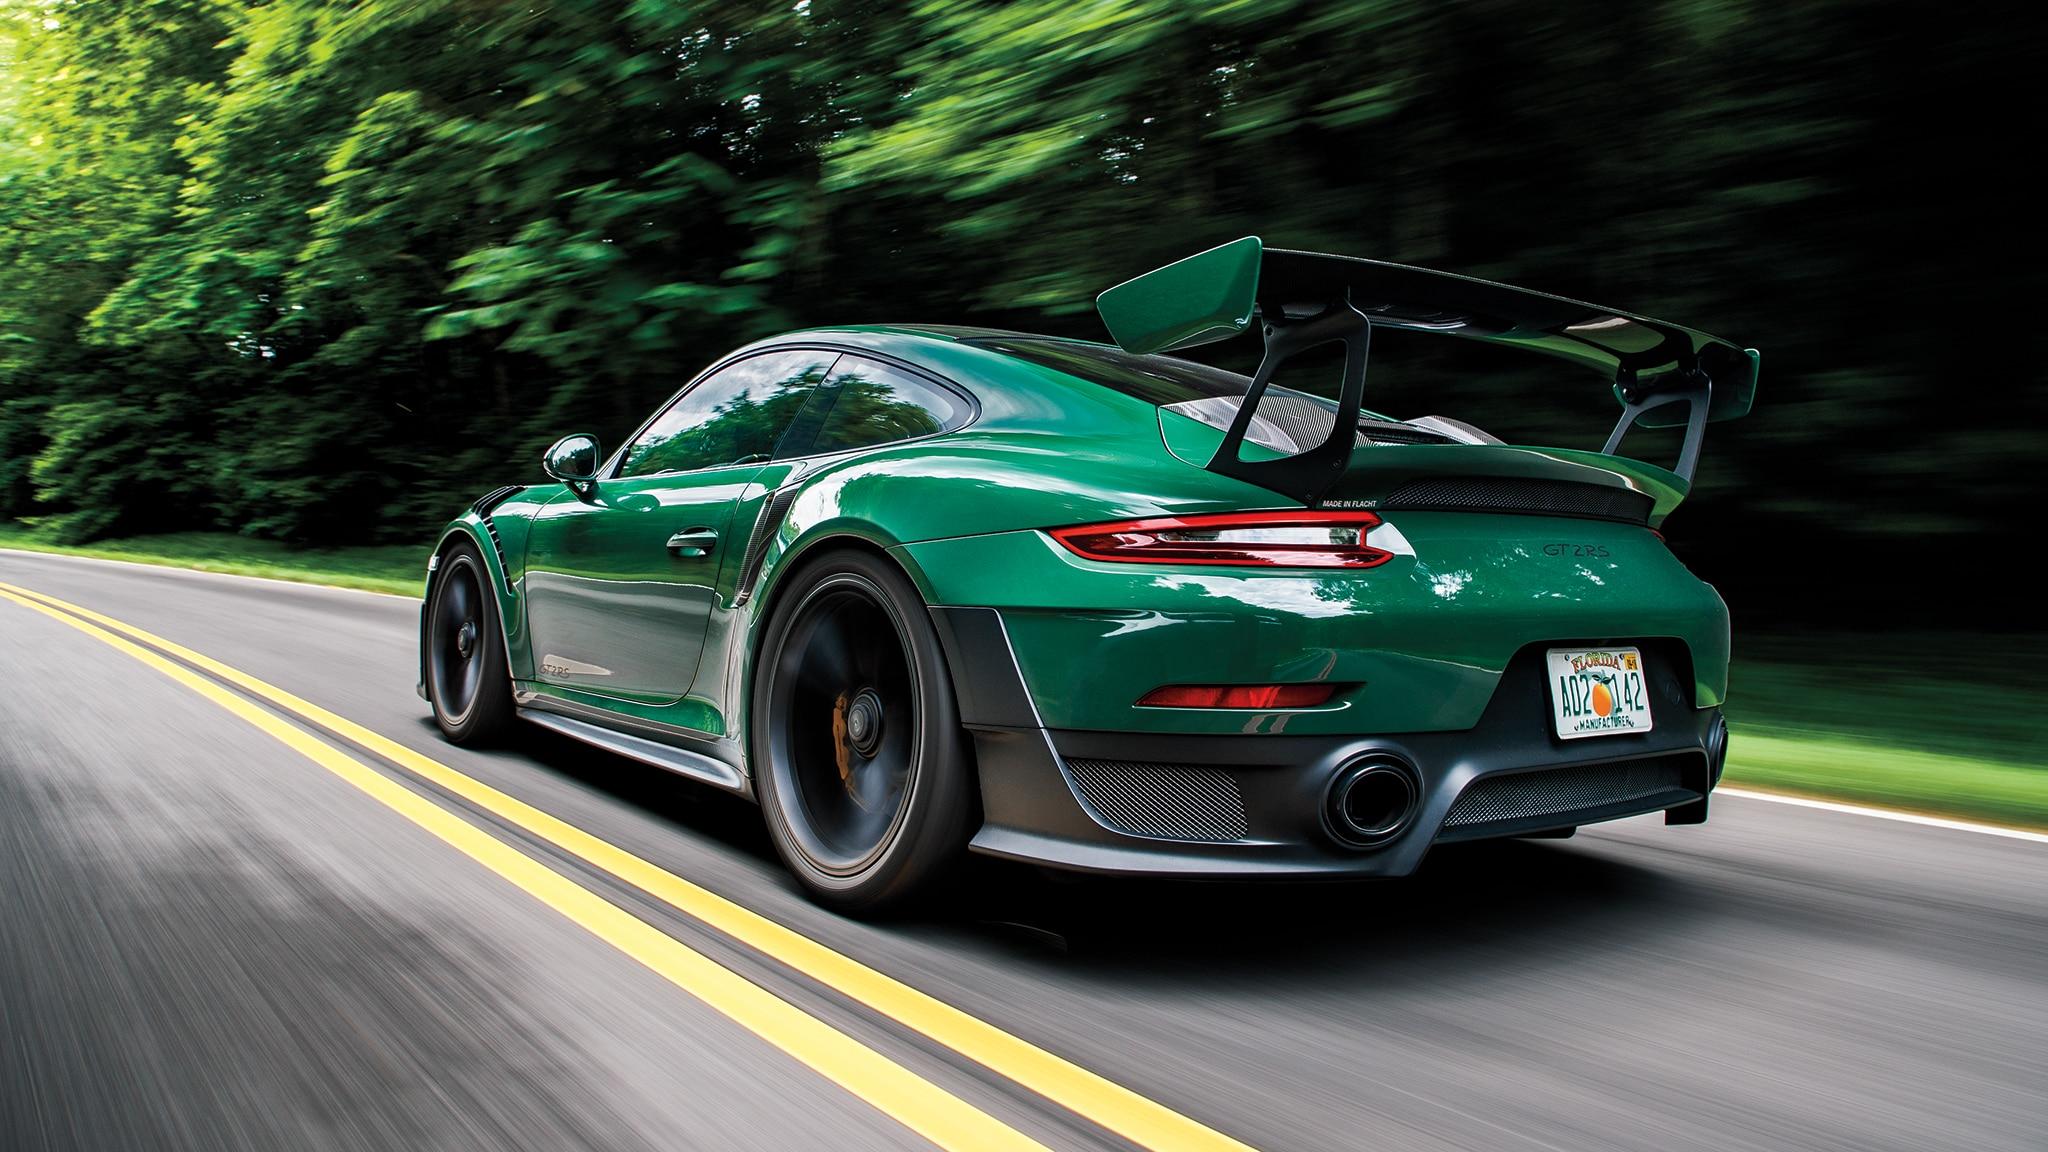 Acura Mdx Vs Rdx >> What Makes the Porsche 911 Continually Great?   Automobile